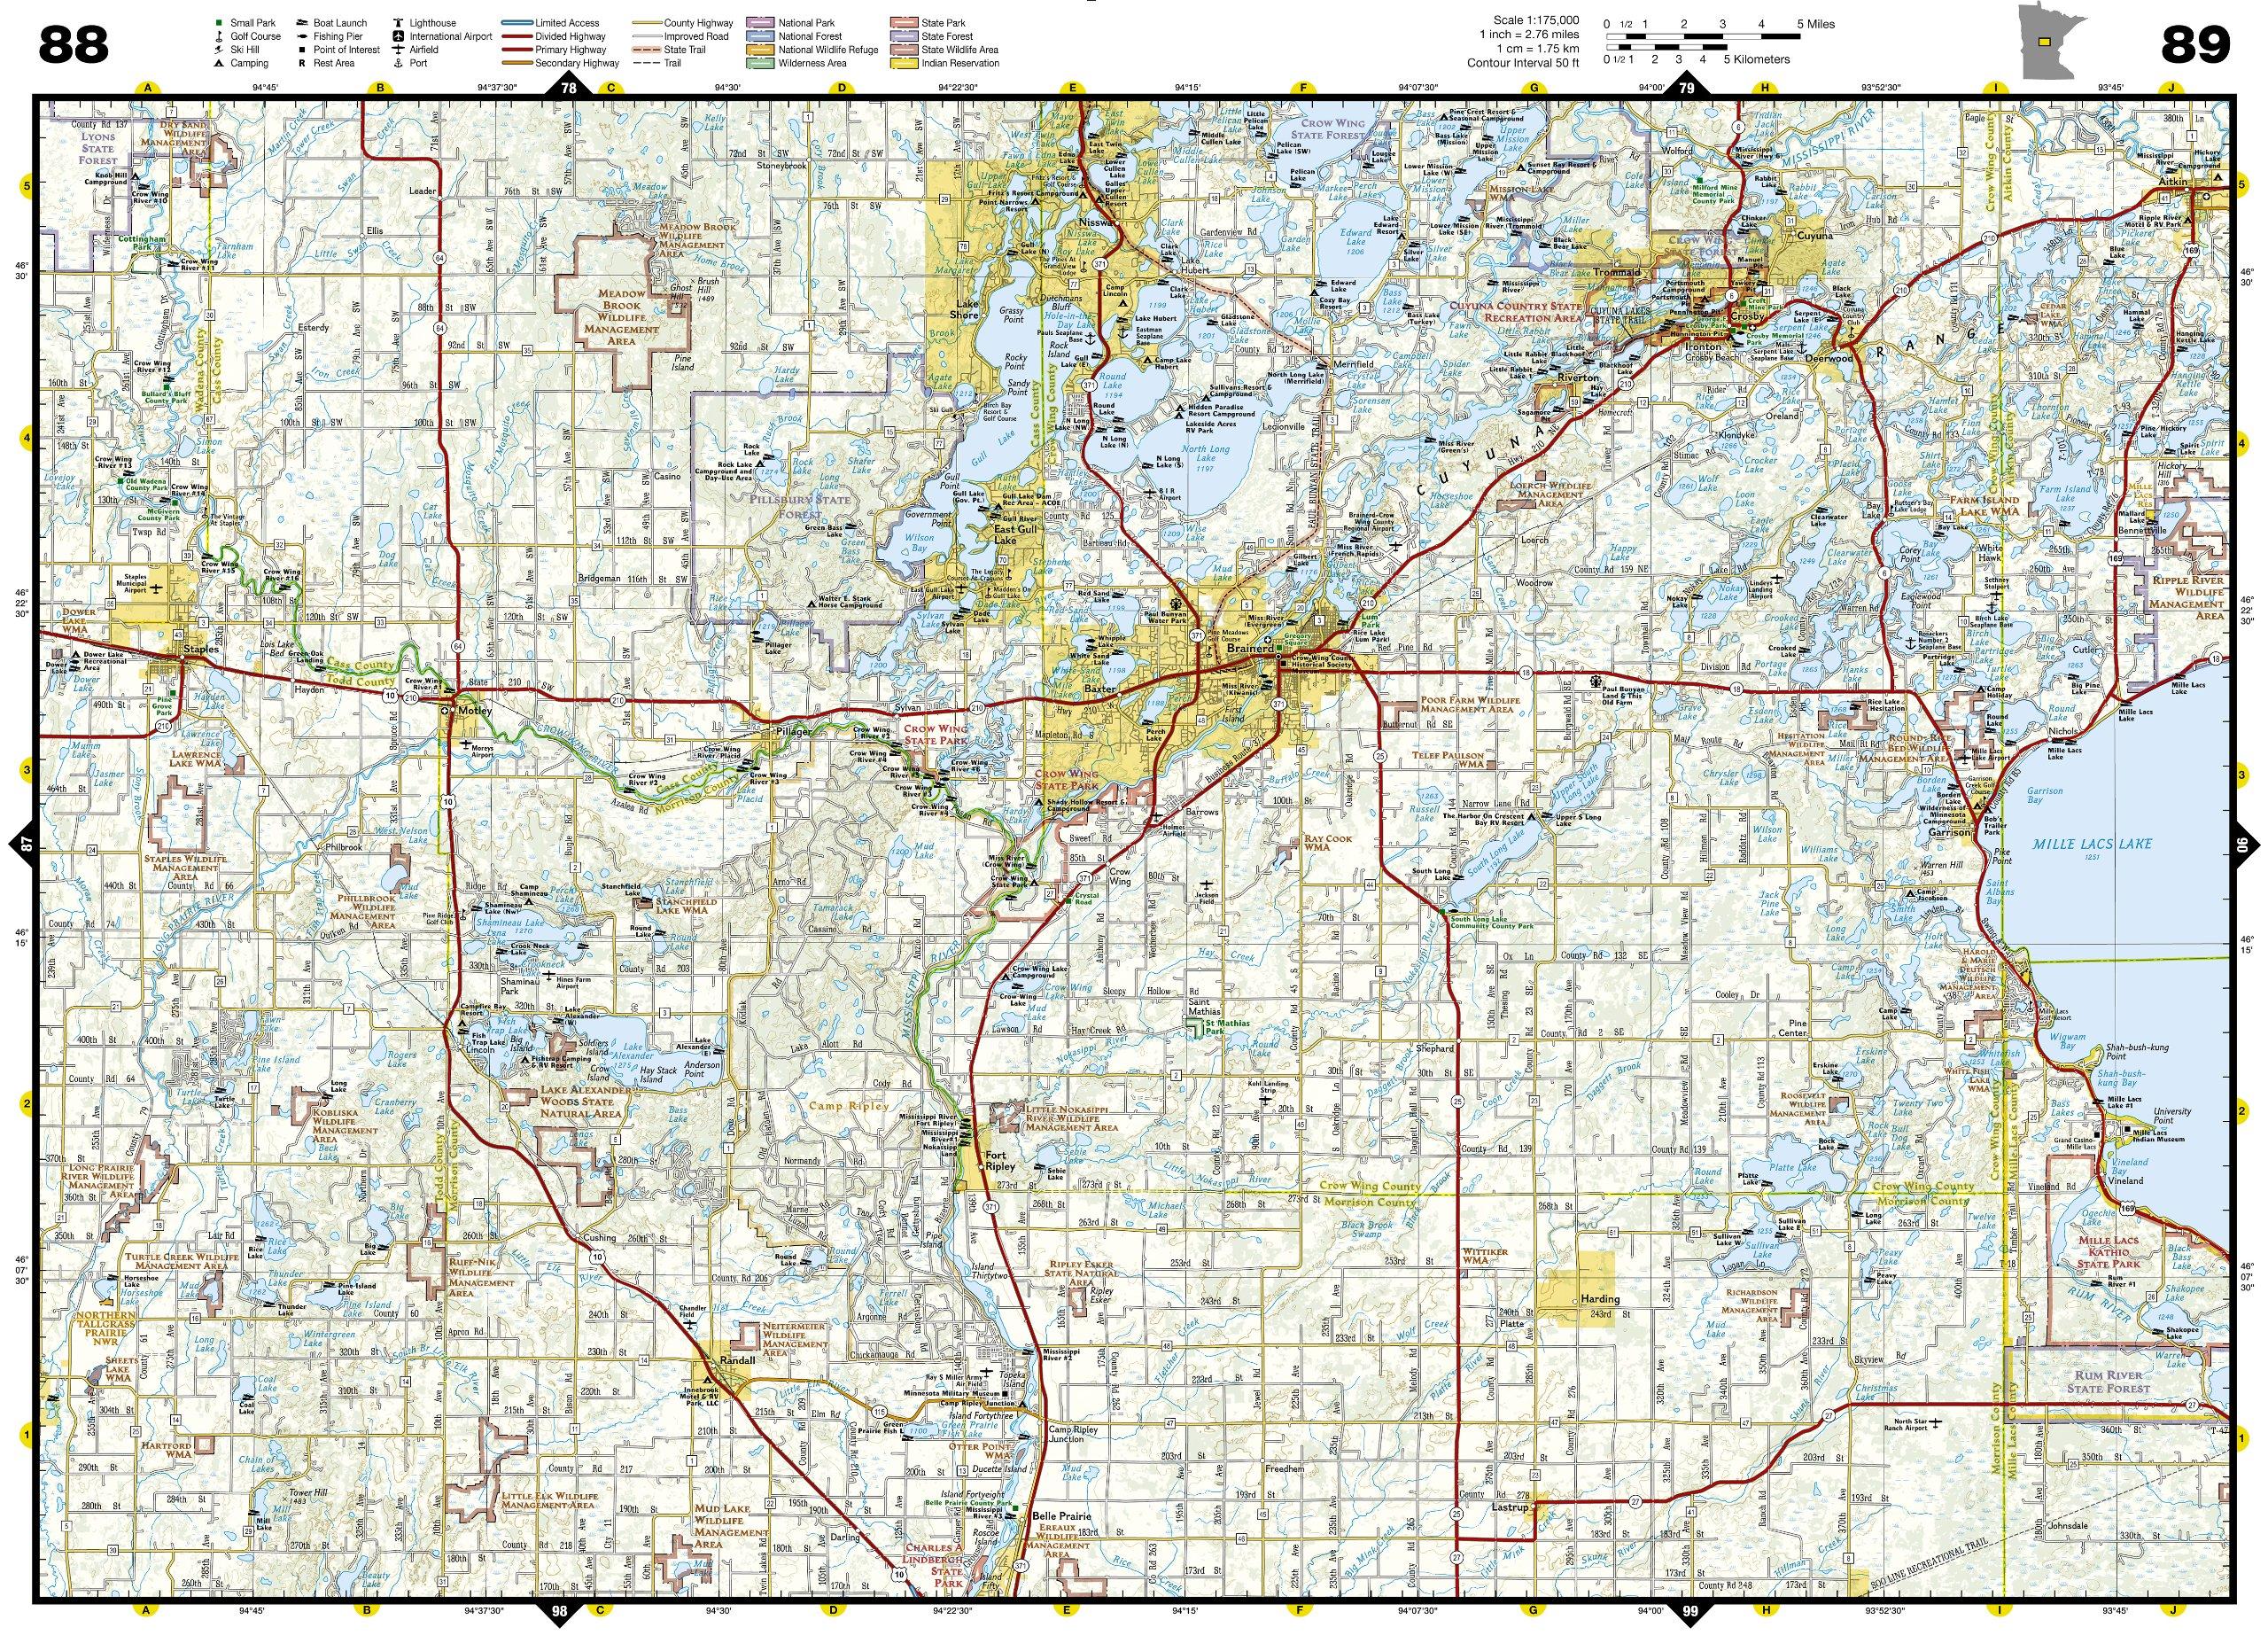 Minnesota Recreation Atlas National Geographic Recreation Atlas